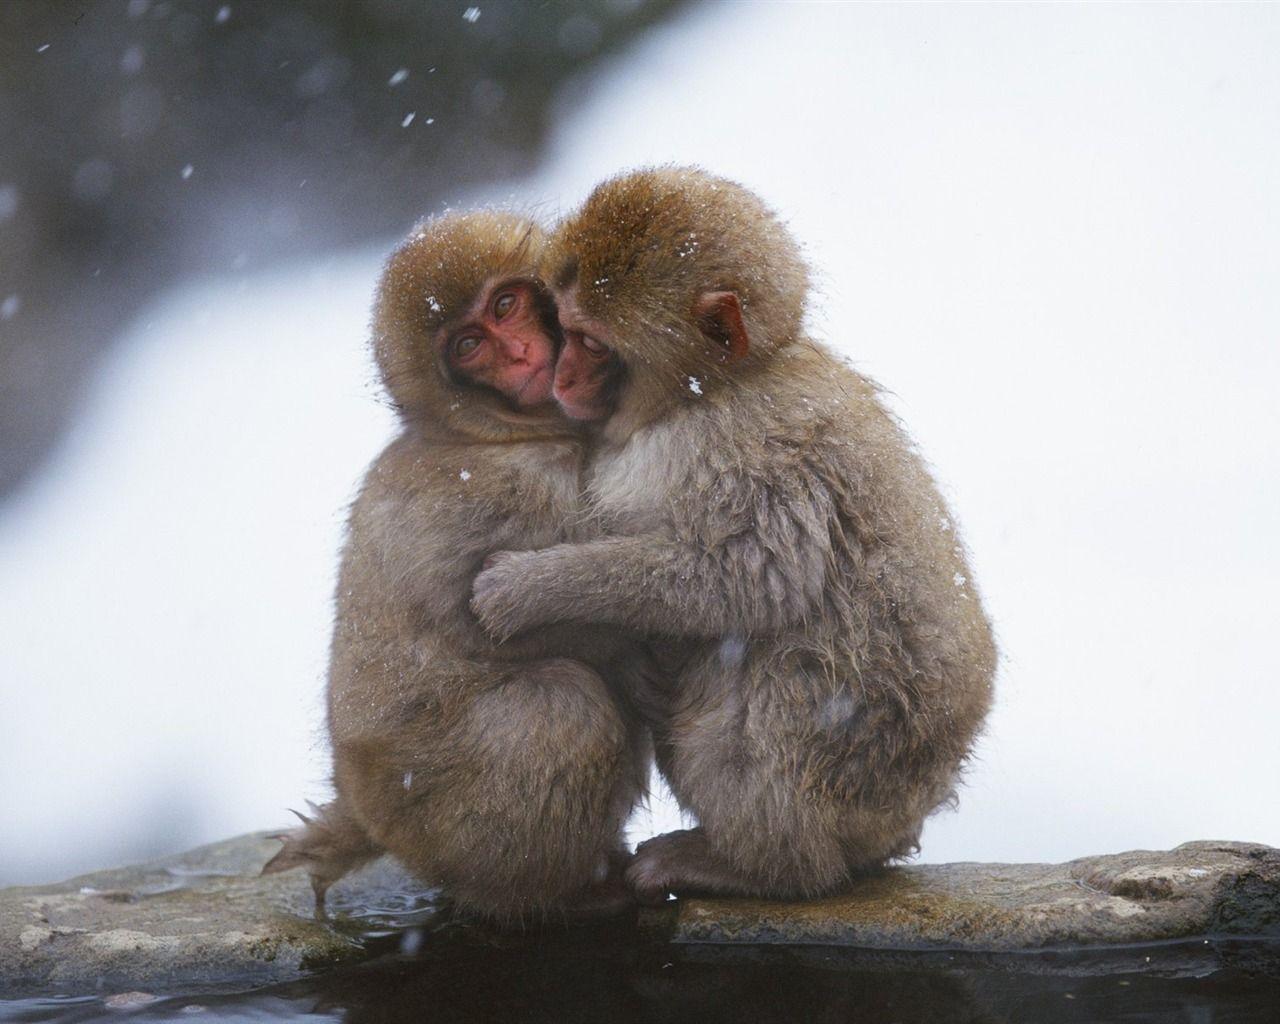 Snow hugged the monkey wallpaper - 1280x1024 wallpaper download -